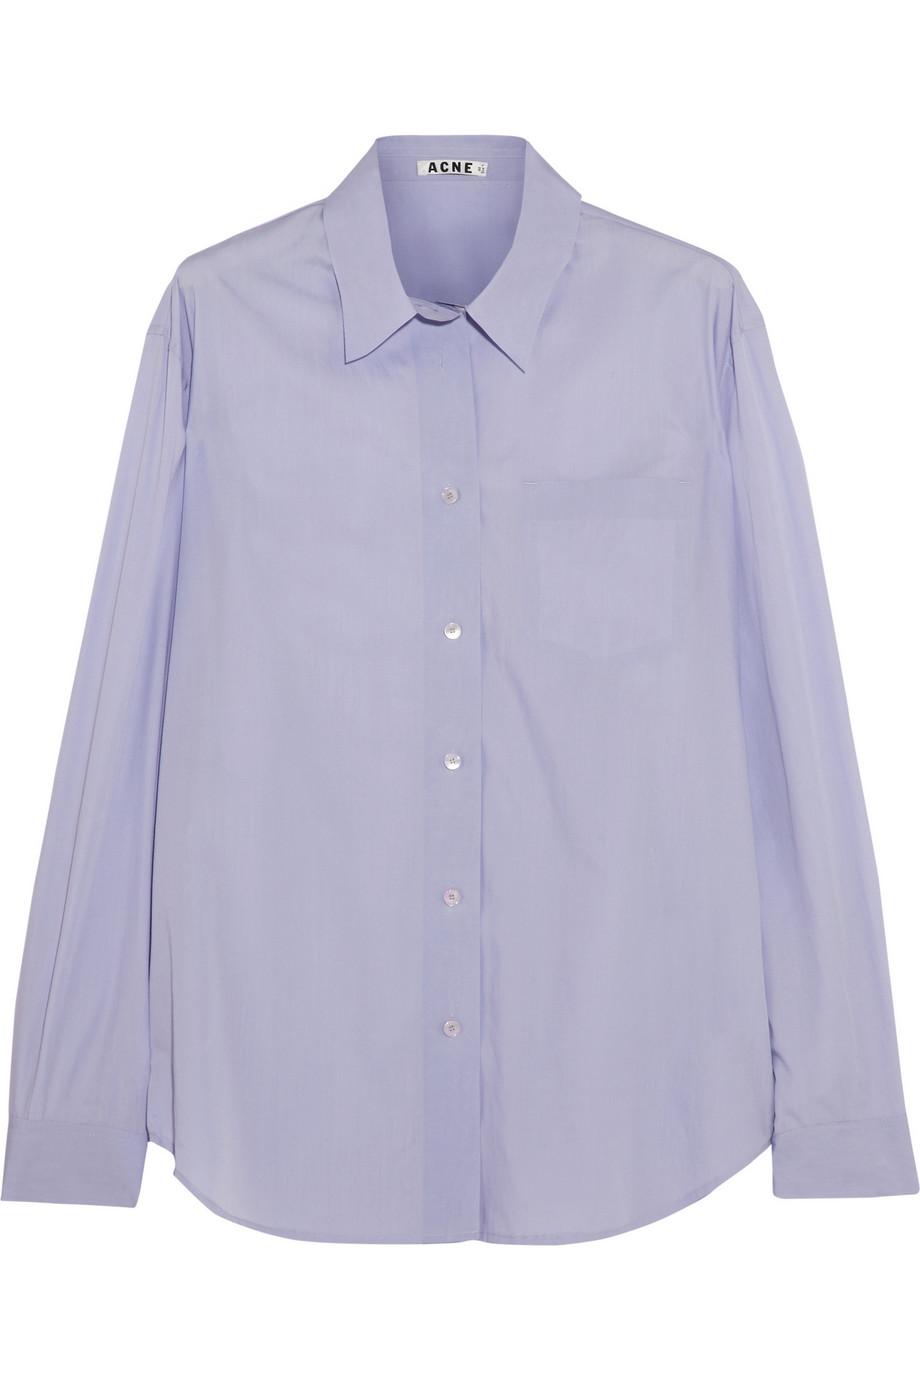 Acne Studios Patti cotton-poplin shirt – 60% at THE OUTNET.COM